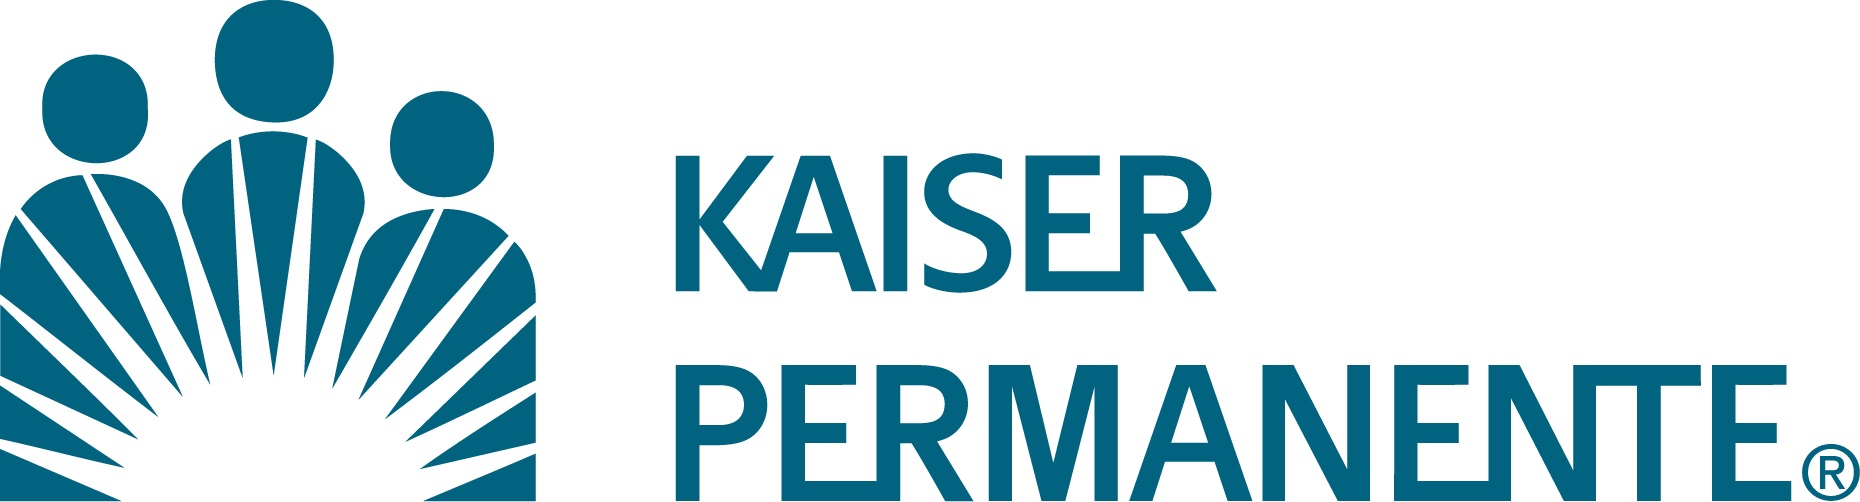 Kaiser Permanente Pharmacy Records Subpoena Info For Legal Professionals